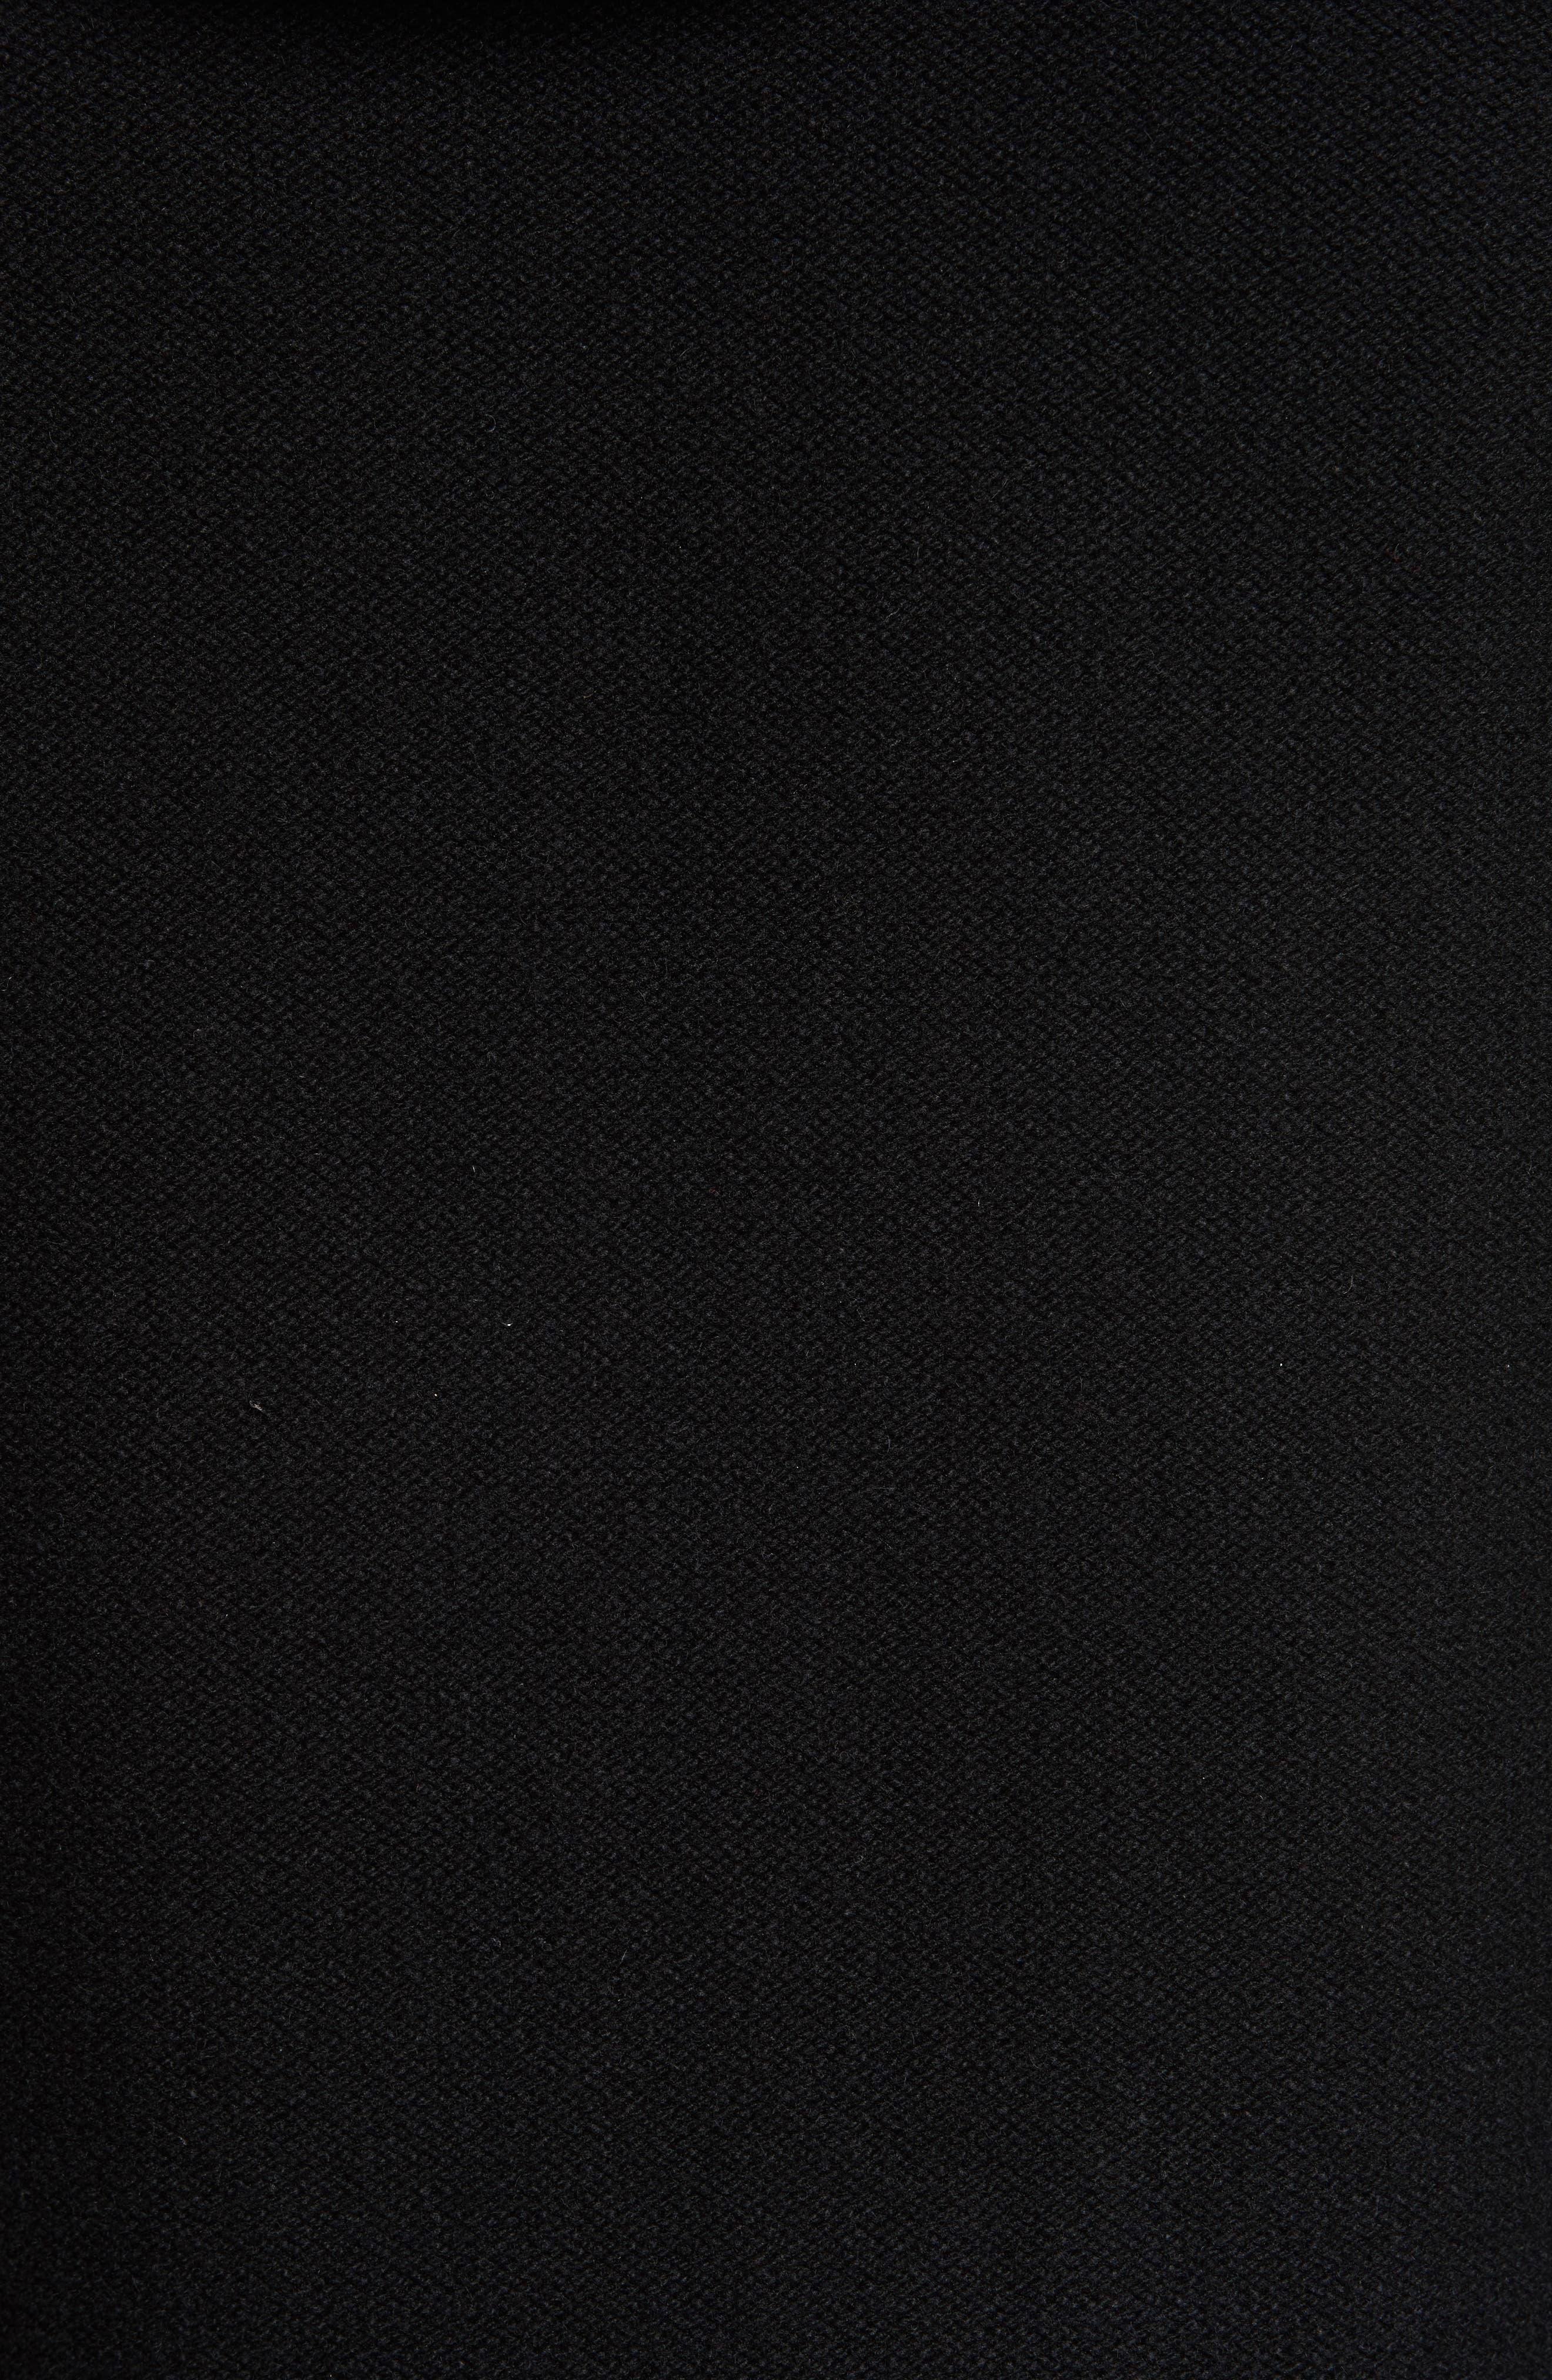 Knit Zip Hoodie with Faux Fur Trim,                             Alternate thumbnail 5, color,                             001